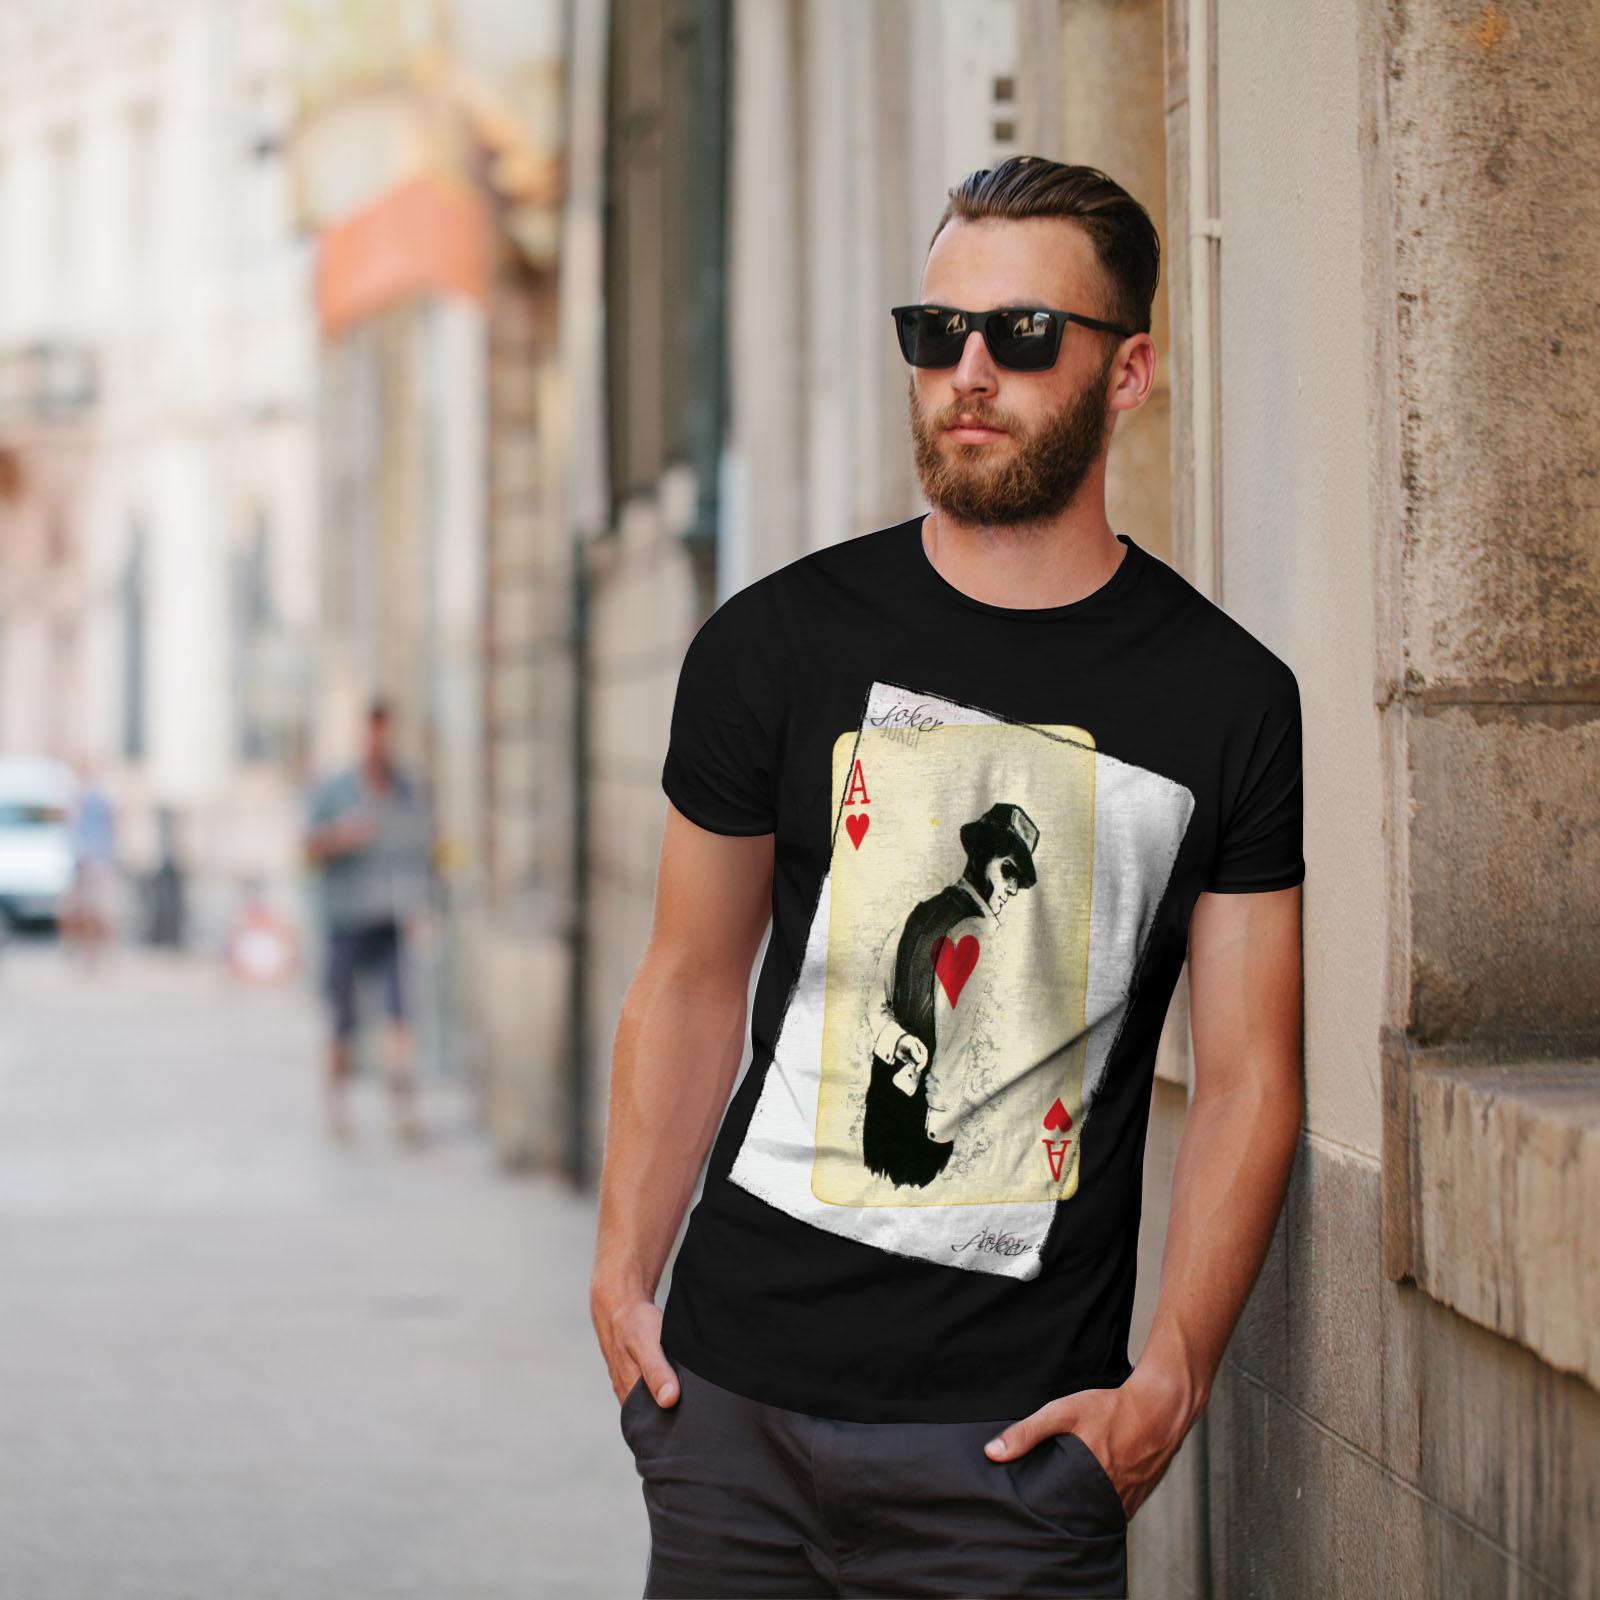 Wellcoda-POKER-misterioso-Da-Uomo-T-shirt-Gamble-design-grafico-stampato-T-shirt miniatura 5